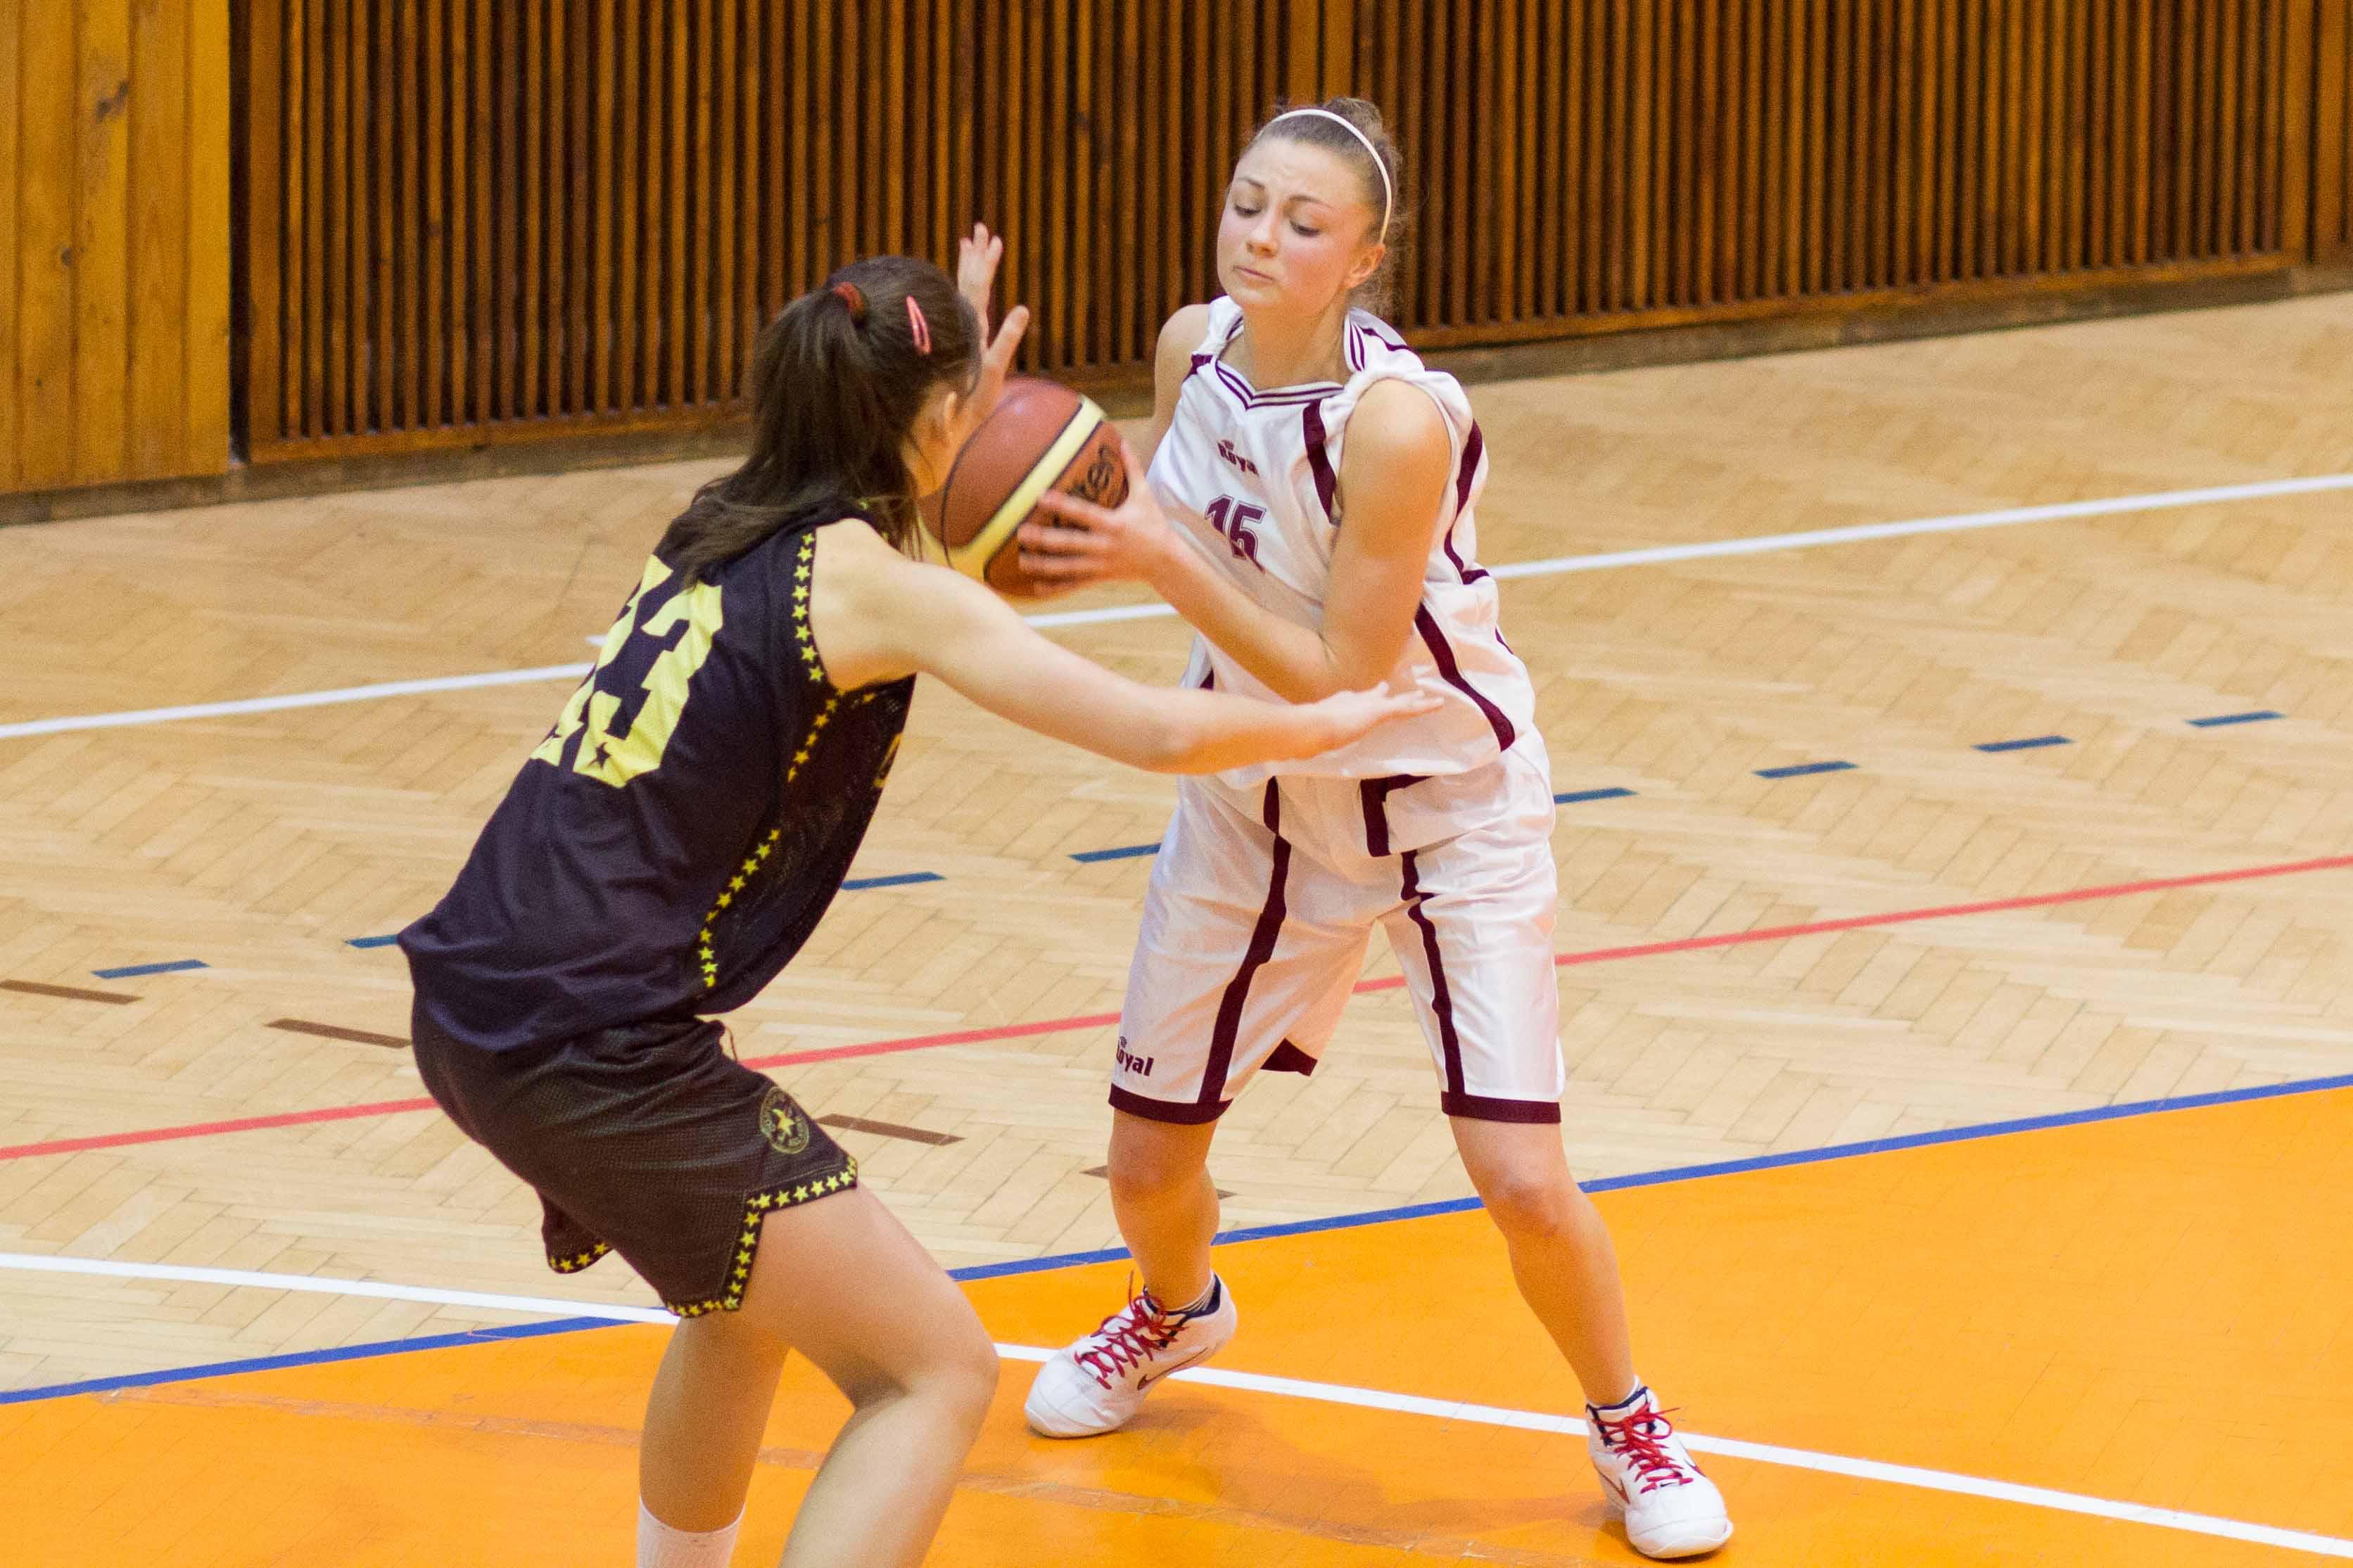 bk-zvolen-cbk-kosice-juniorky-2012-basketbal-6